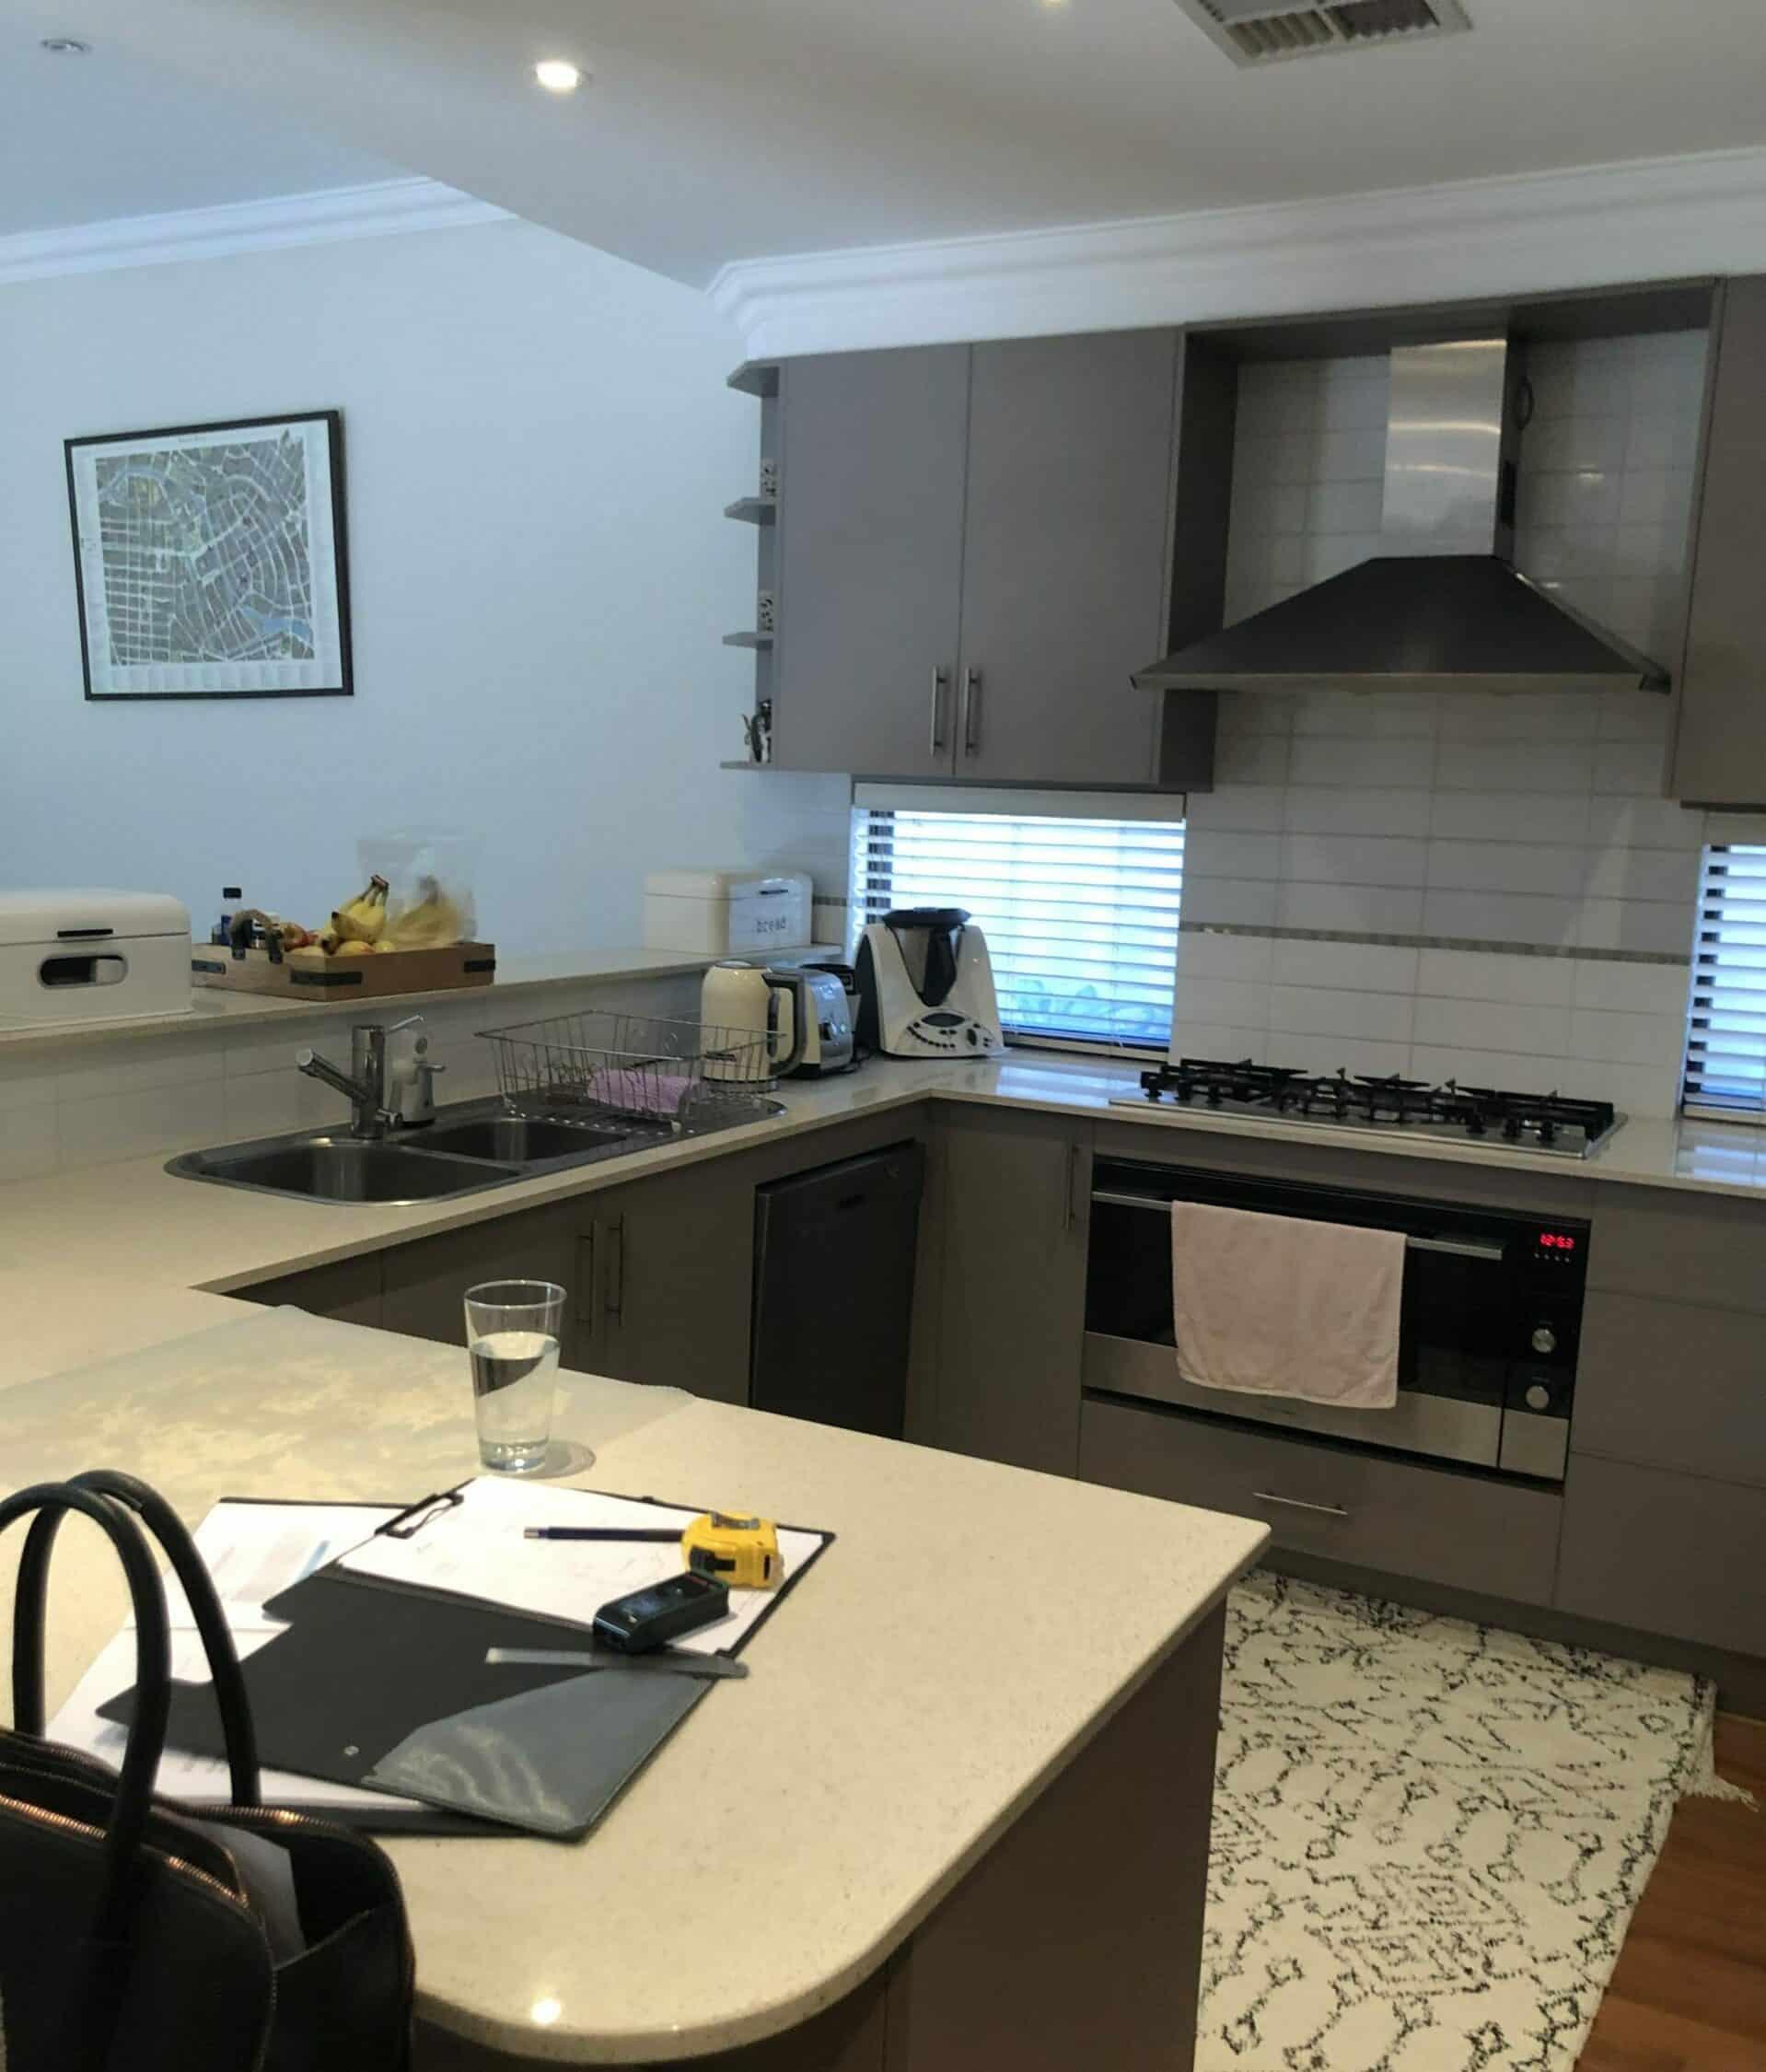 Joondanna Hamptons Kitchen Before - Dark and cluttered